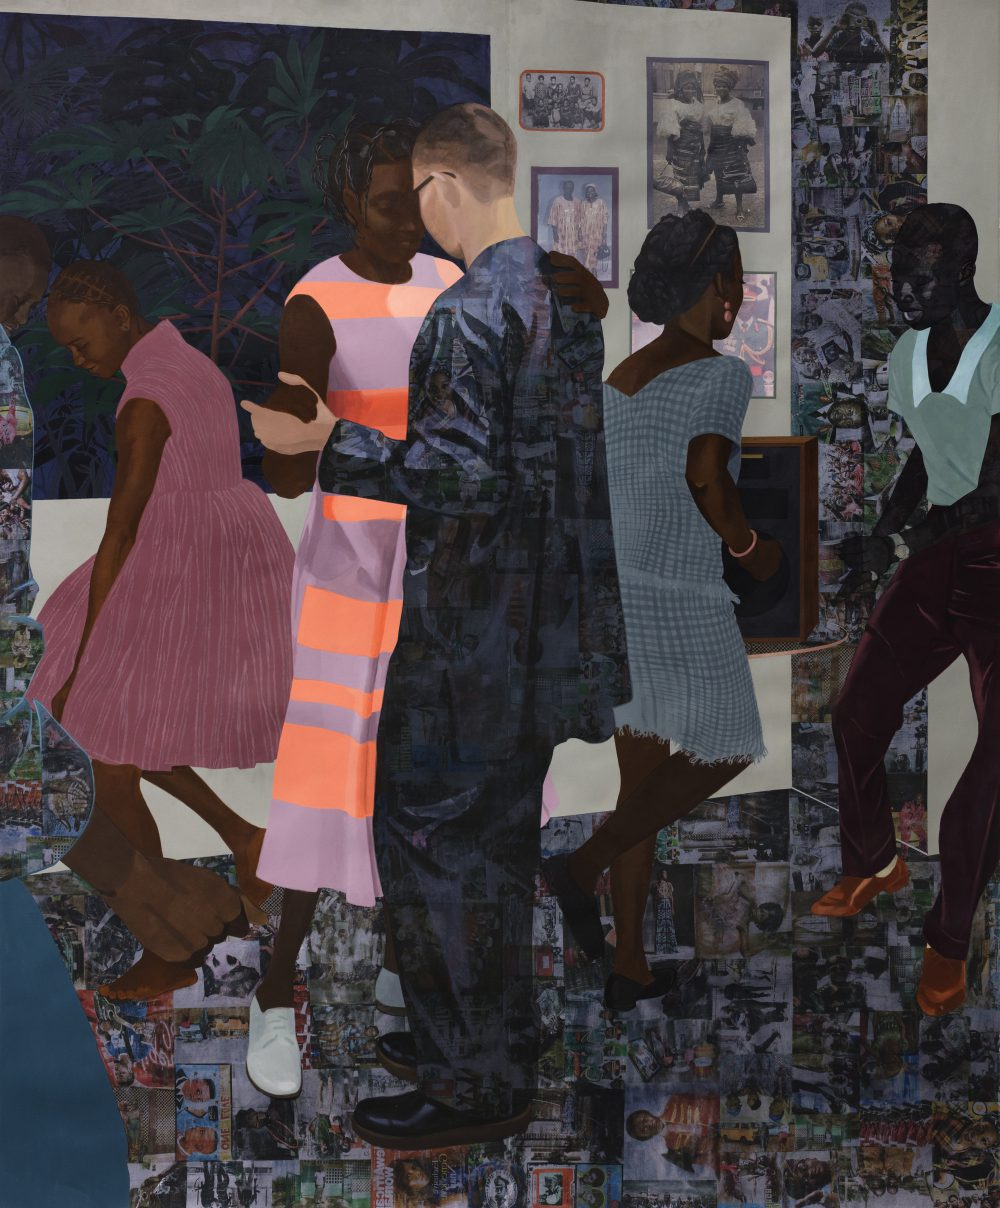 All images: Njideka Akunyili Crosby, Mixed media. Courtesy the artist, Victoria Miro, and David Zwirner